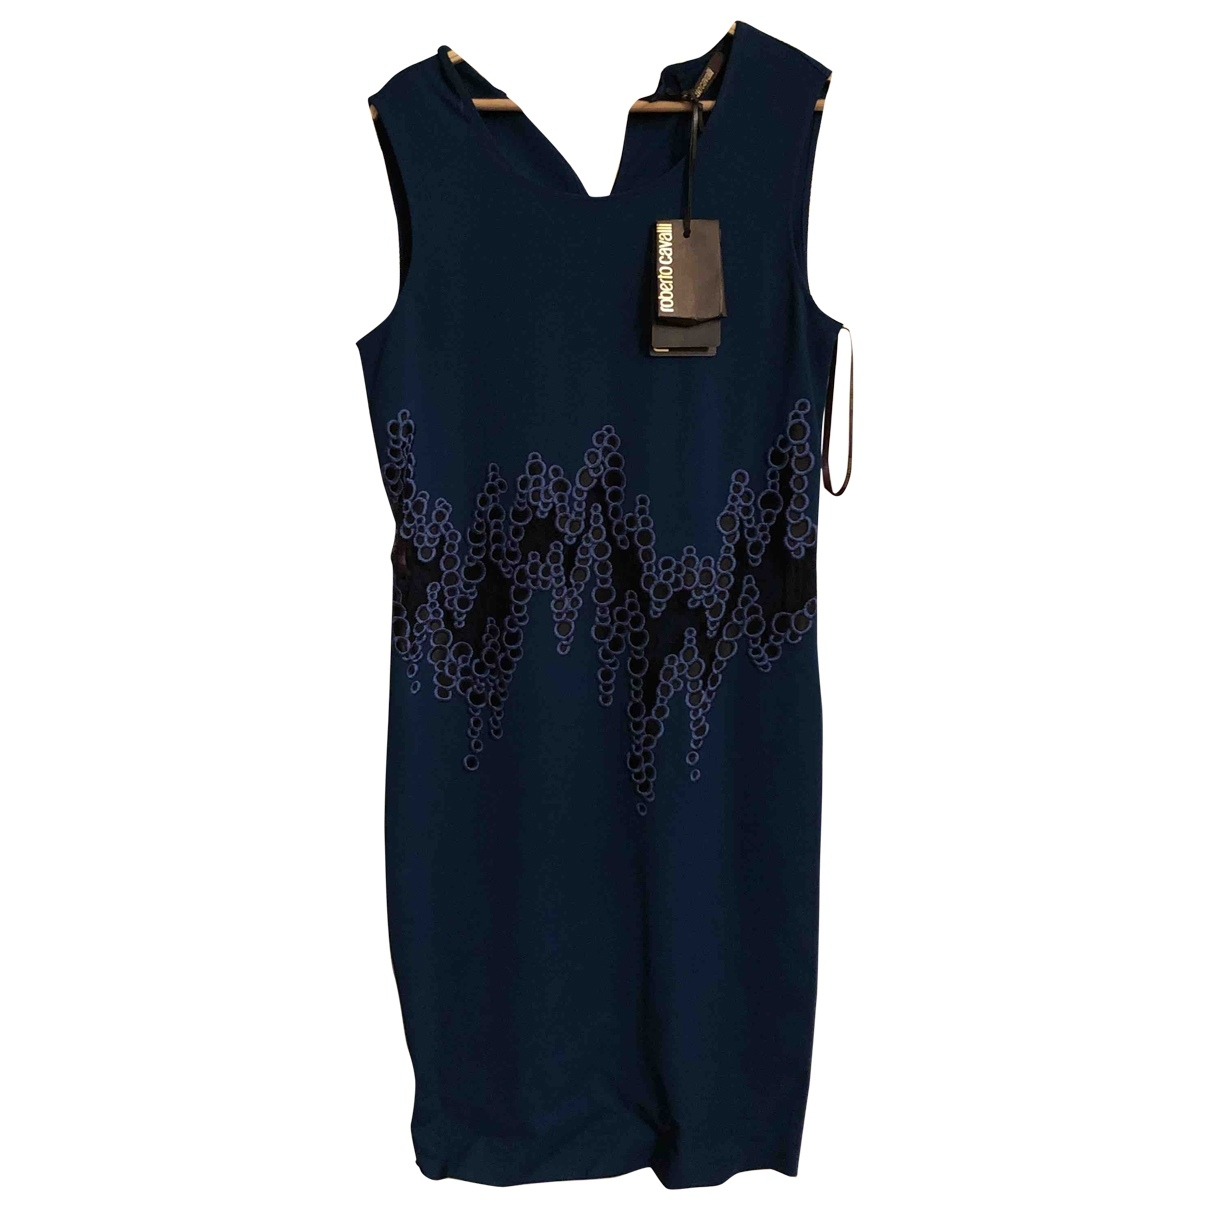 Roberto Cavalli \N Blue dress for Women 42 IT